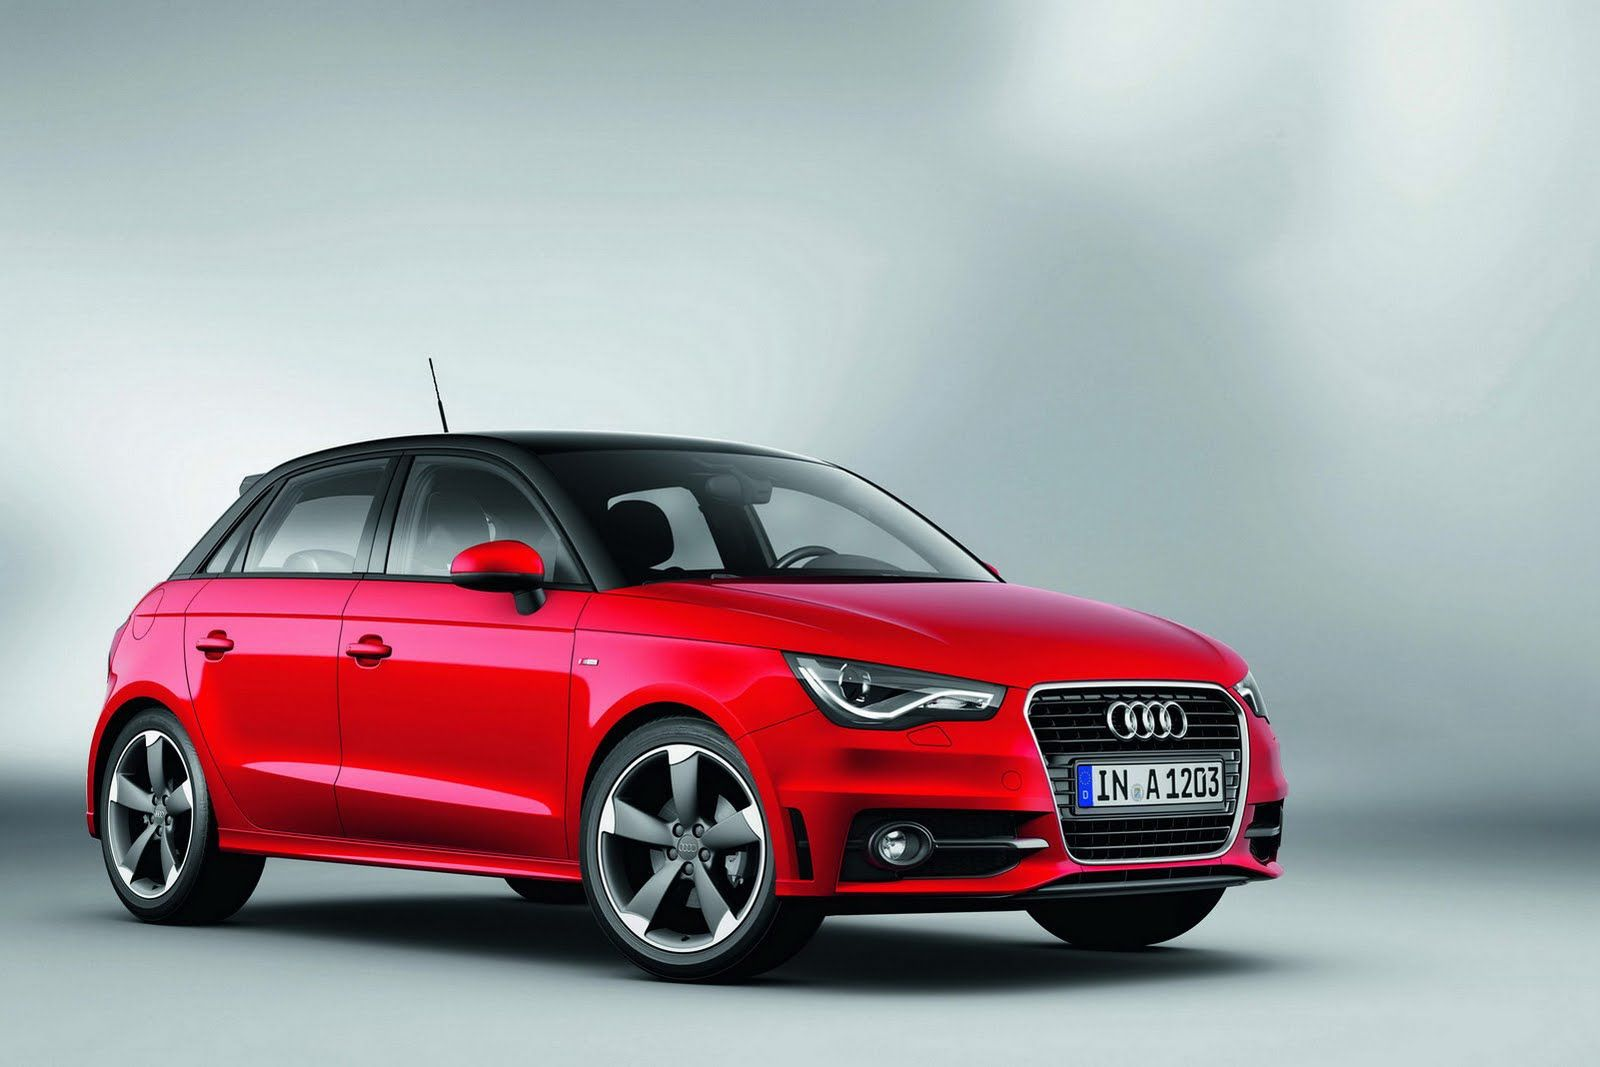 2012 Audi A1 Sportback The Automotive Gallery Voiture Motos